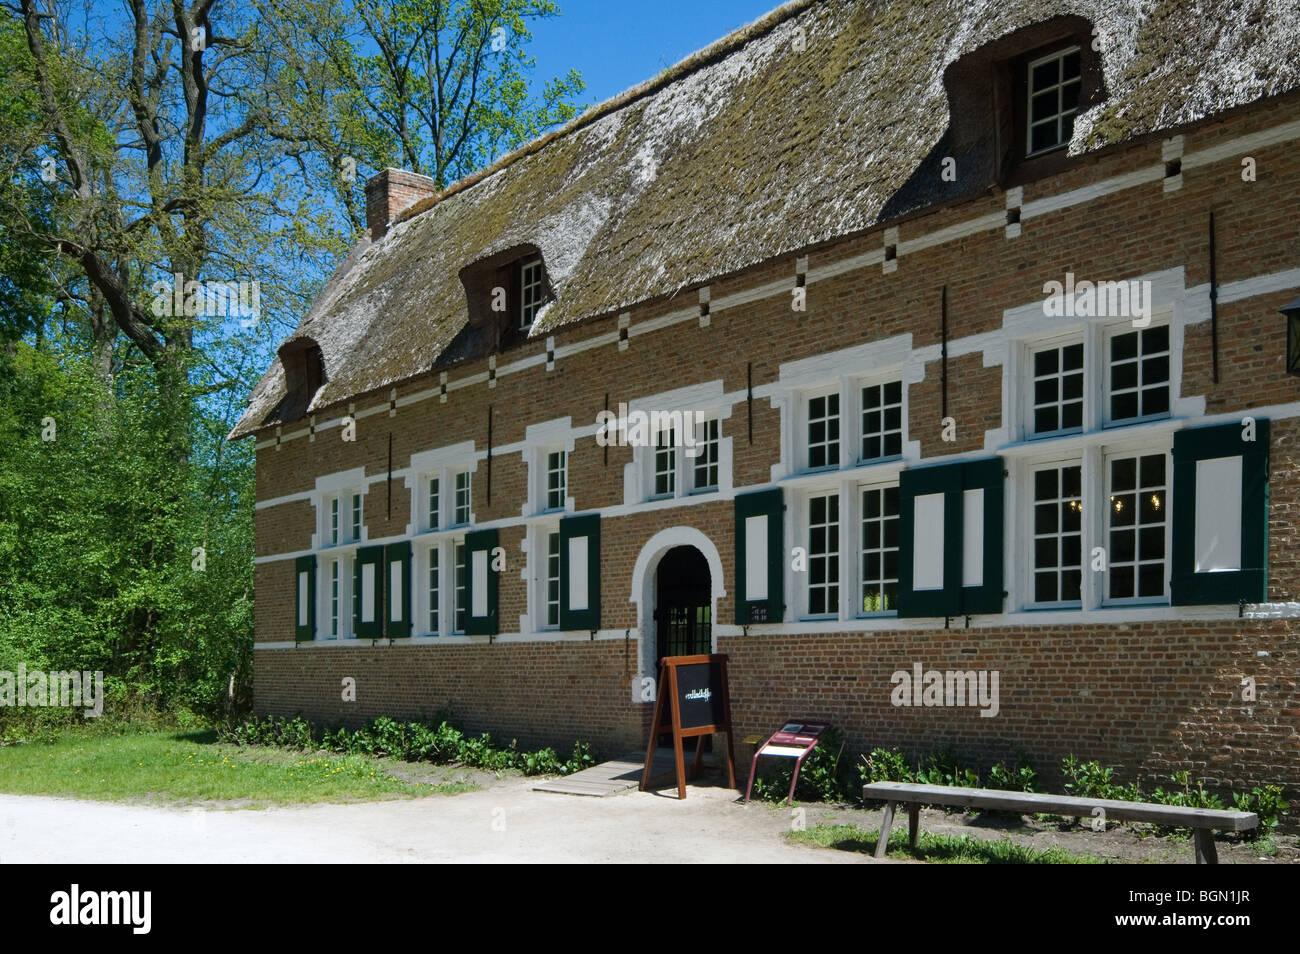 Traditional house in the open air museum Bokrijk, Belgium Stock Photo